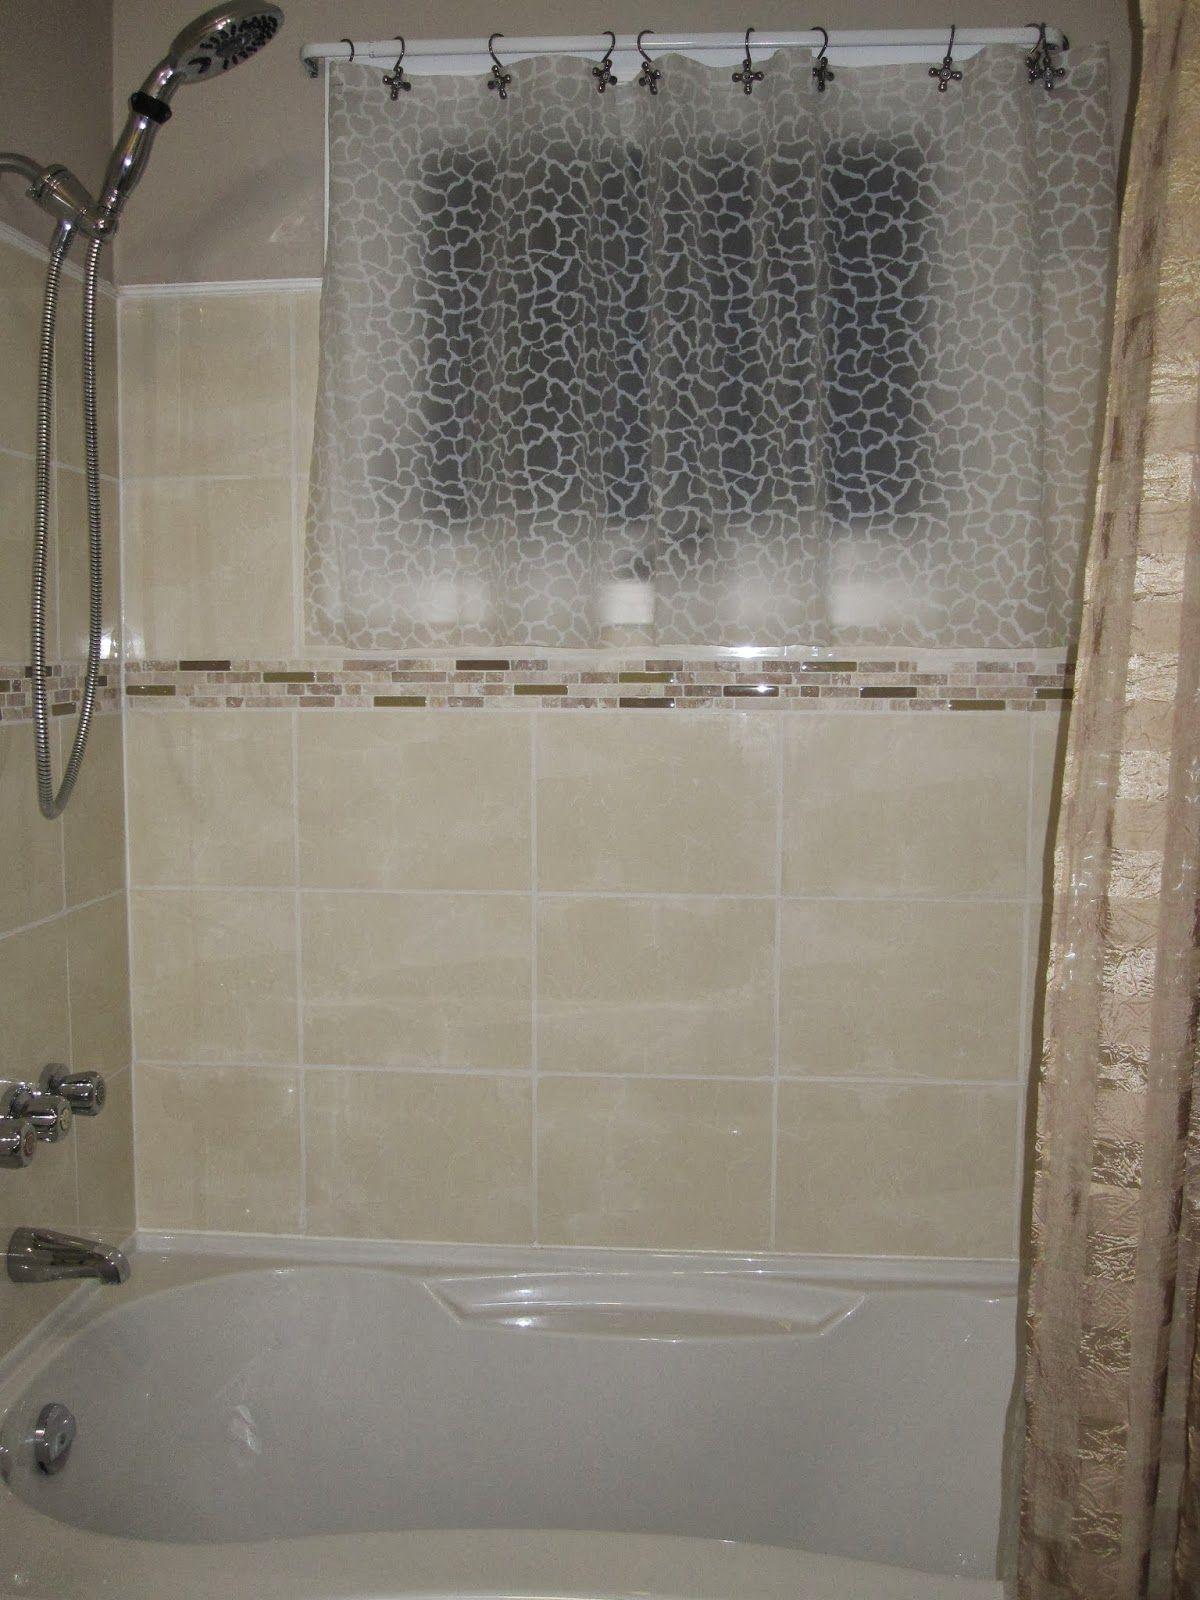 Fine Bedroom Window Covering Ideas On Newest Article Jpg 1200 1600 Bathroom Window Coverings Window In Shower Bathroom Windows In Shower